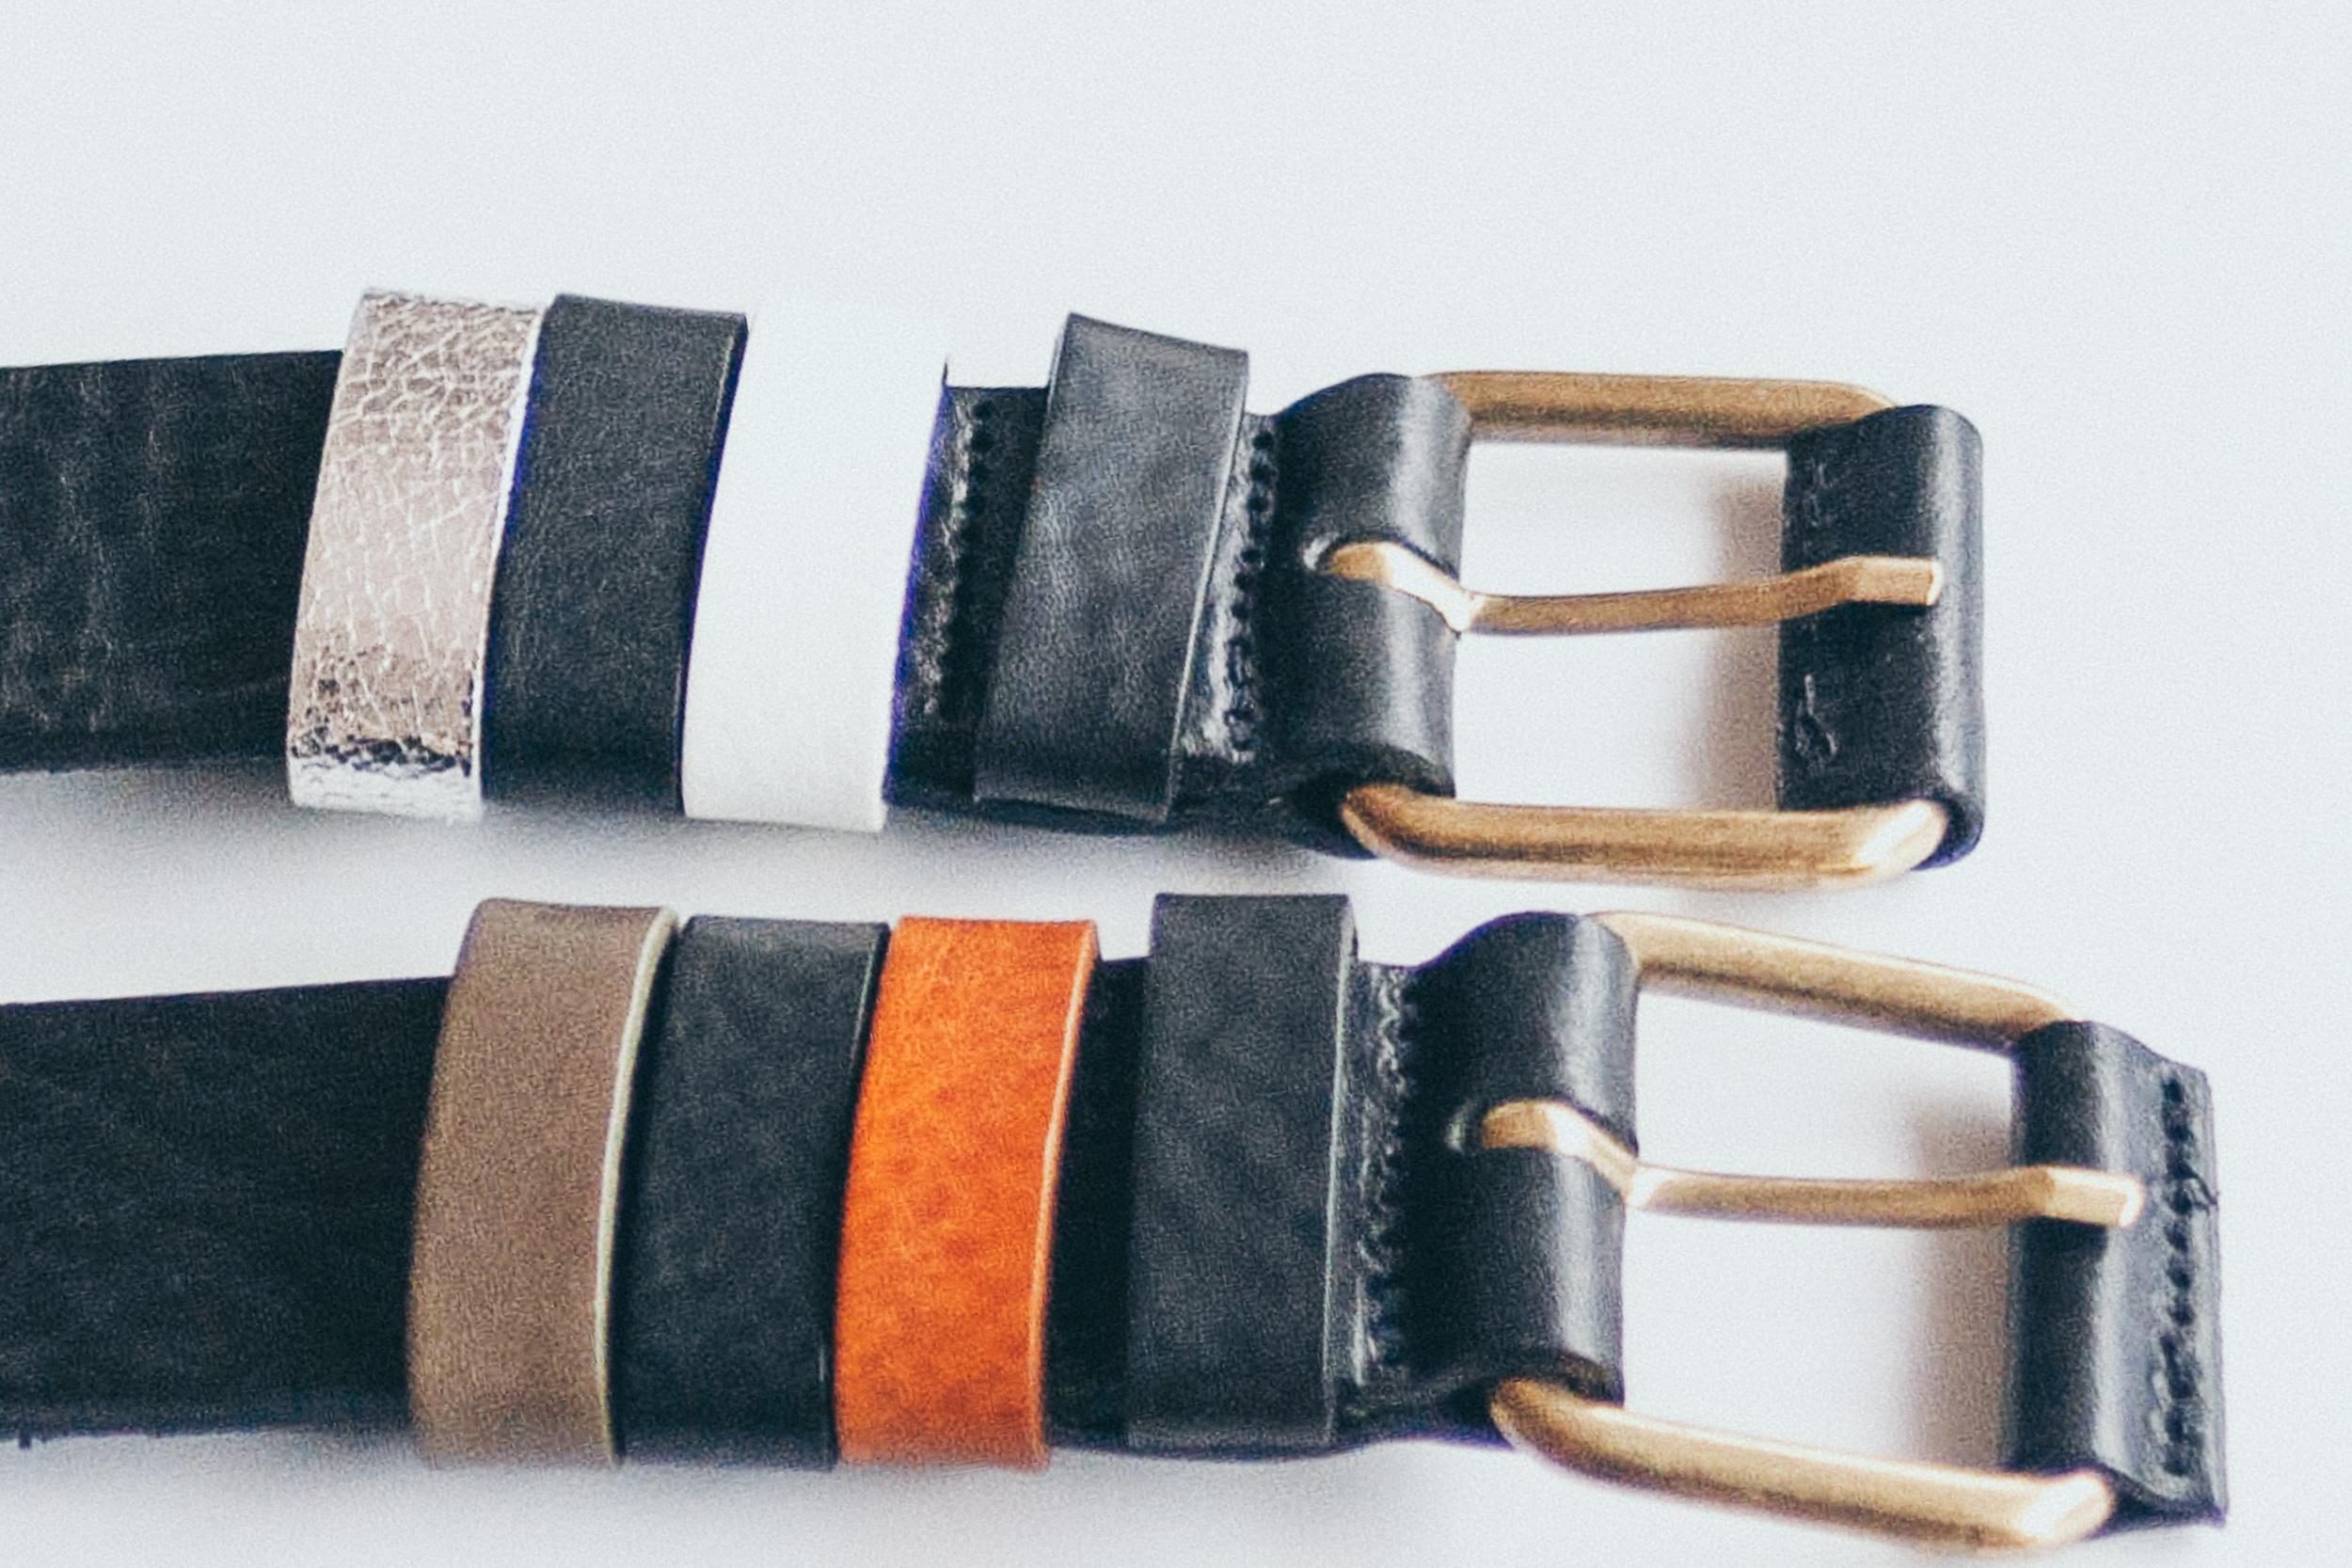 Same belt, different straps